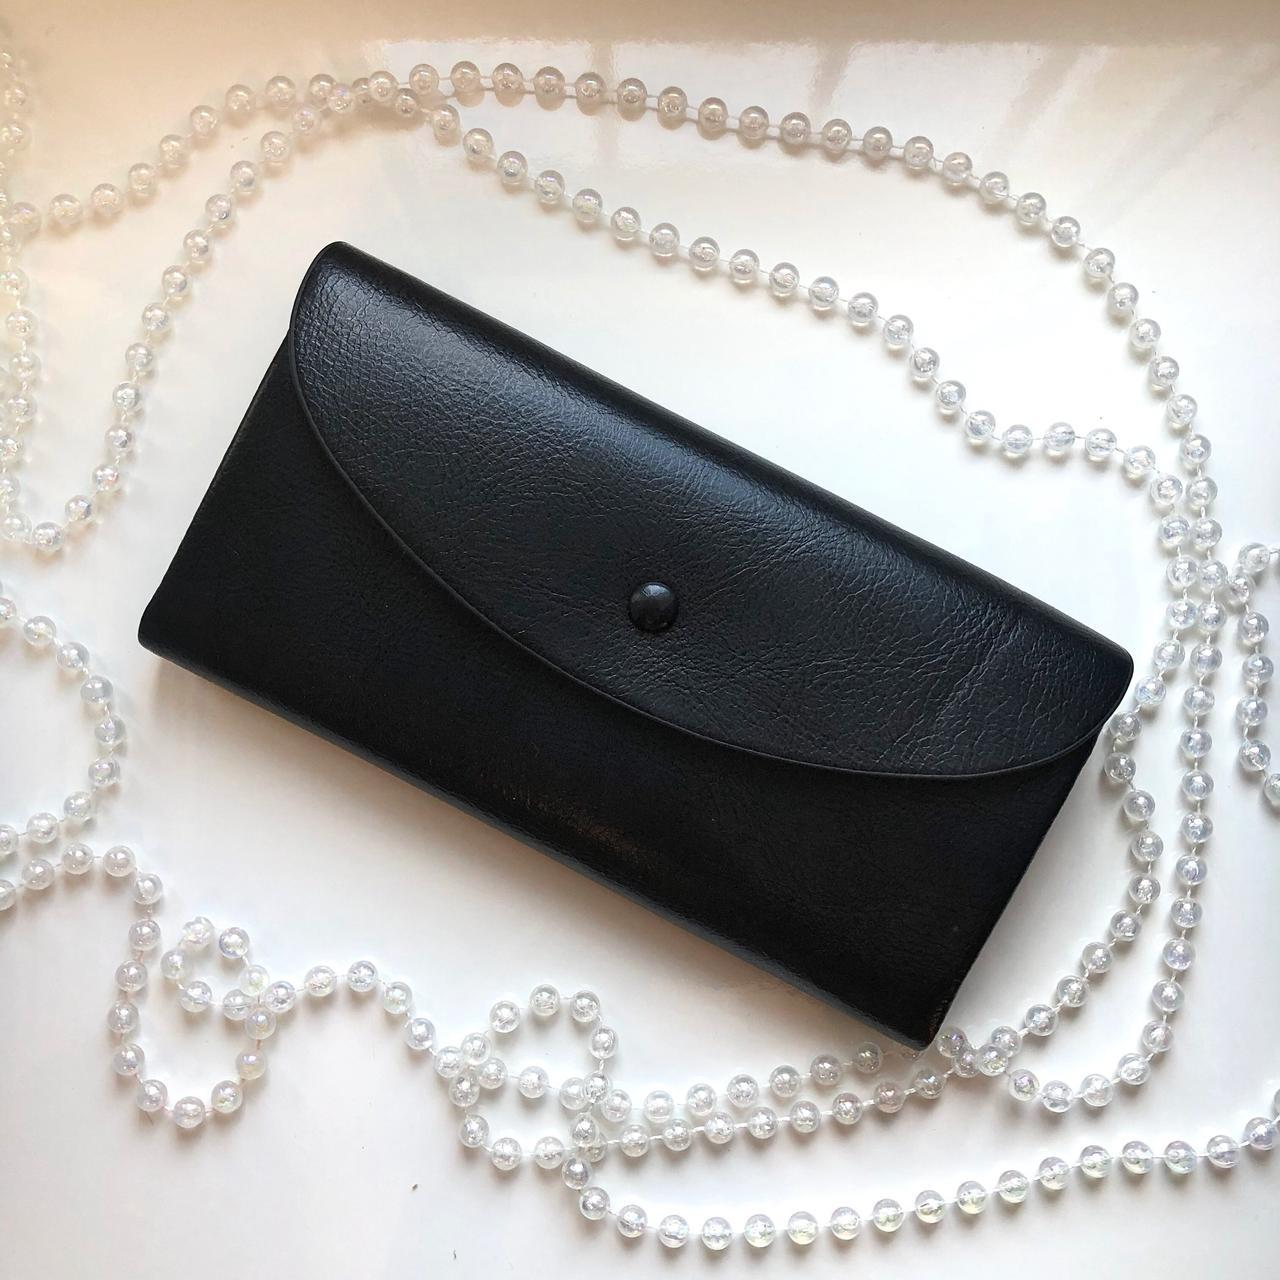 Элегантый женский кошелек-конверт   19*10 см